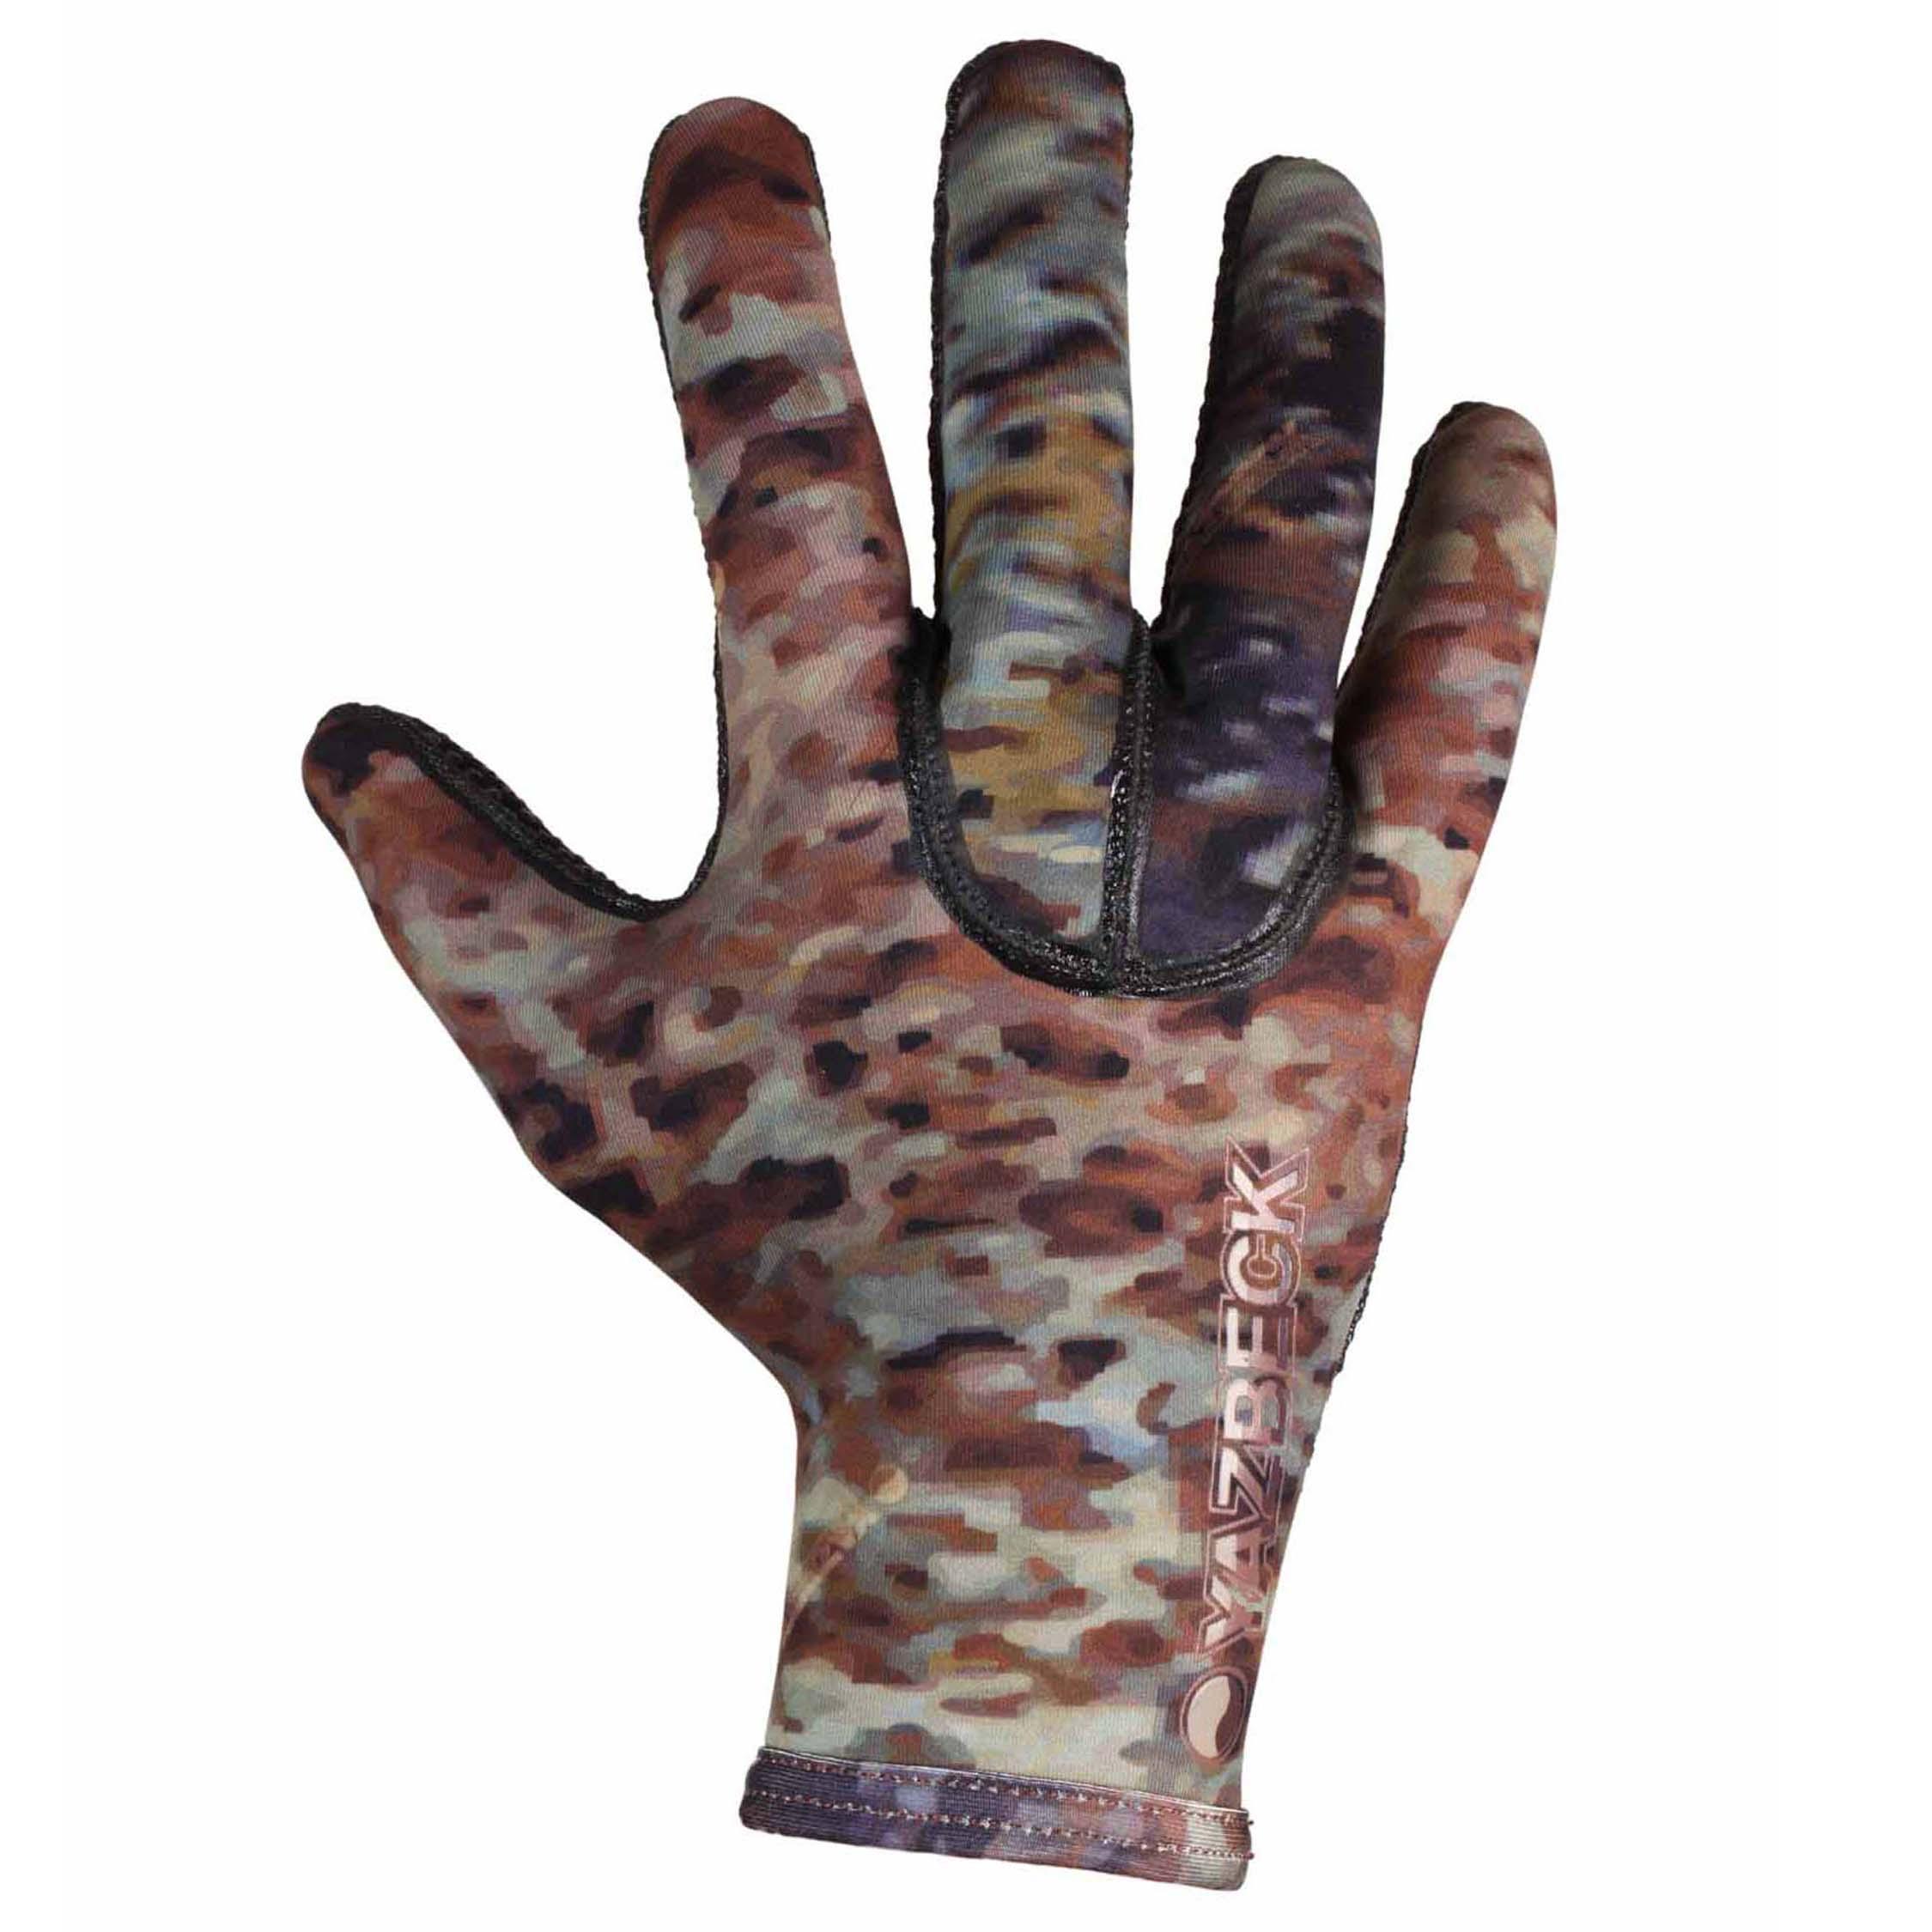 Yazbeck-Hamour-Thermoflex-Titanium-Gloves-Spearfishing-SKU67130